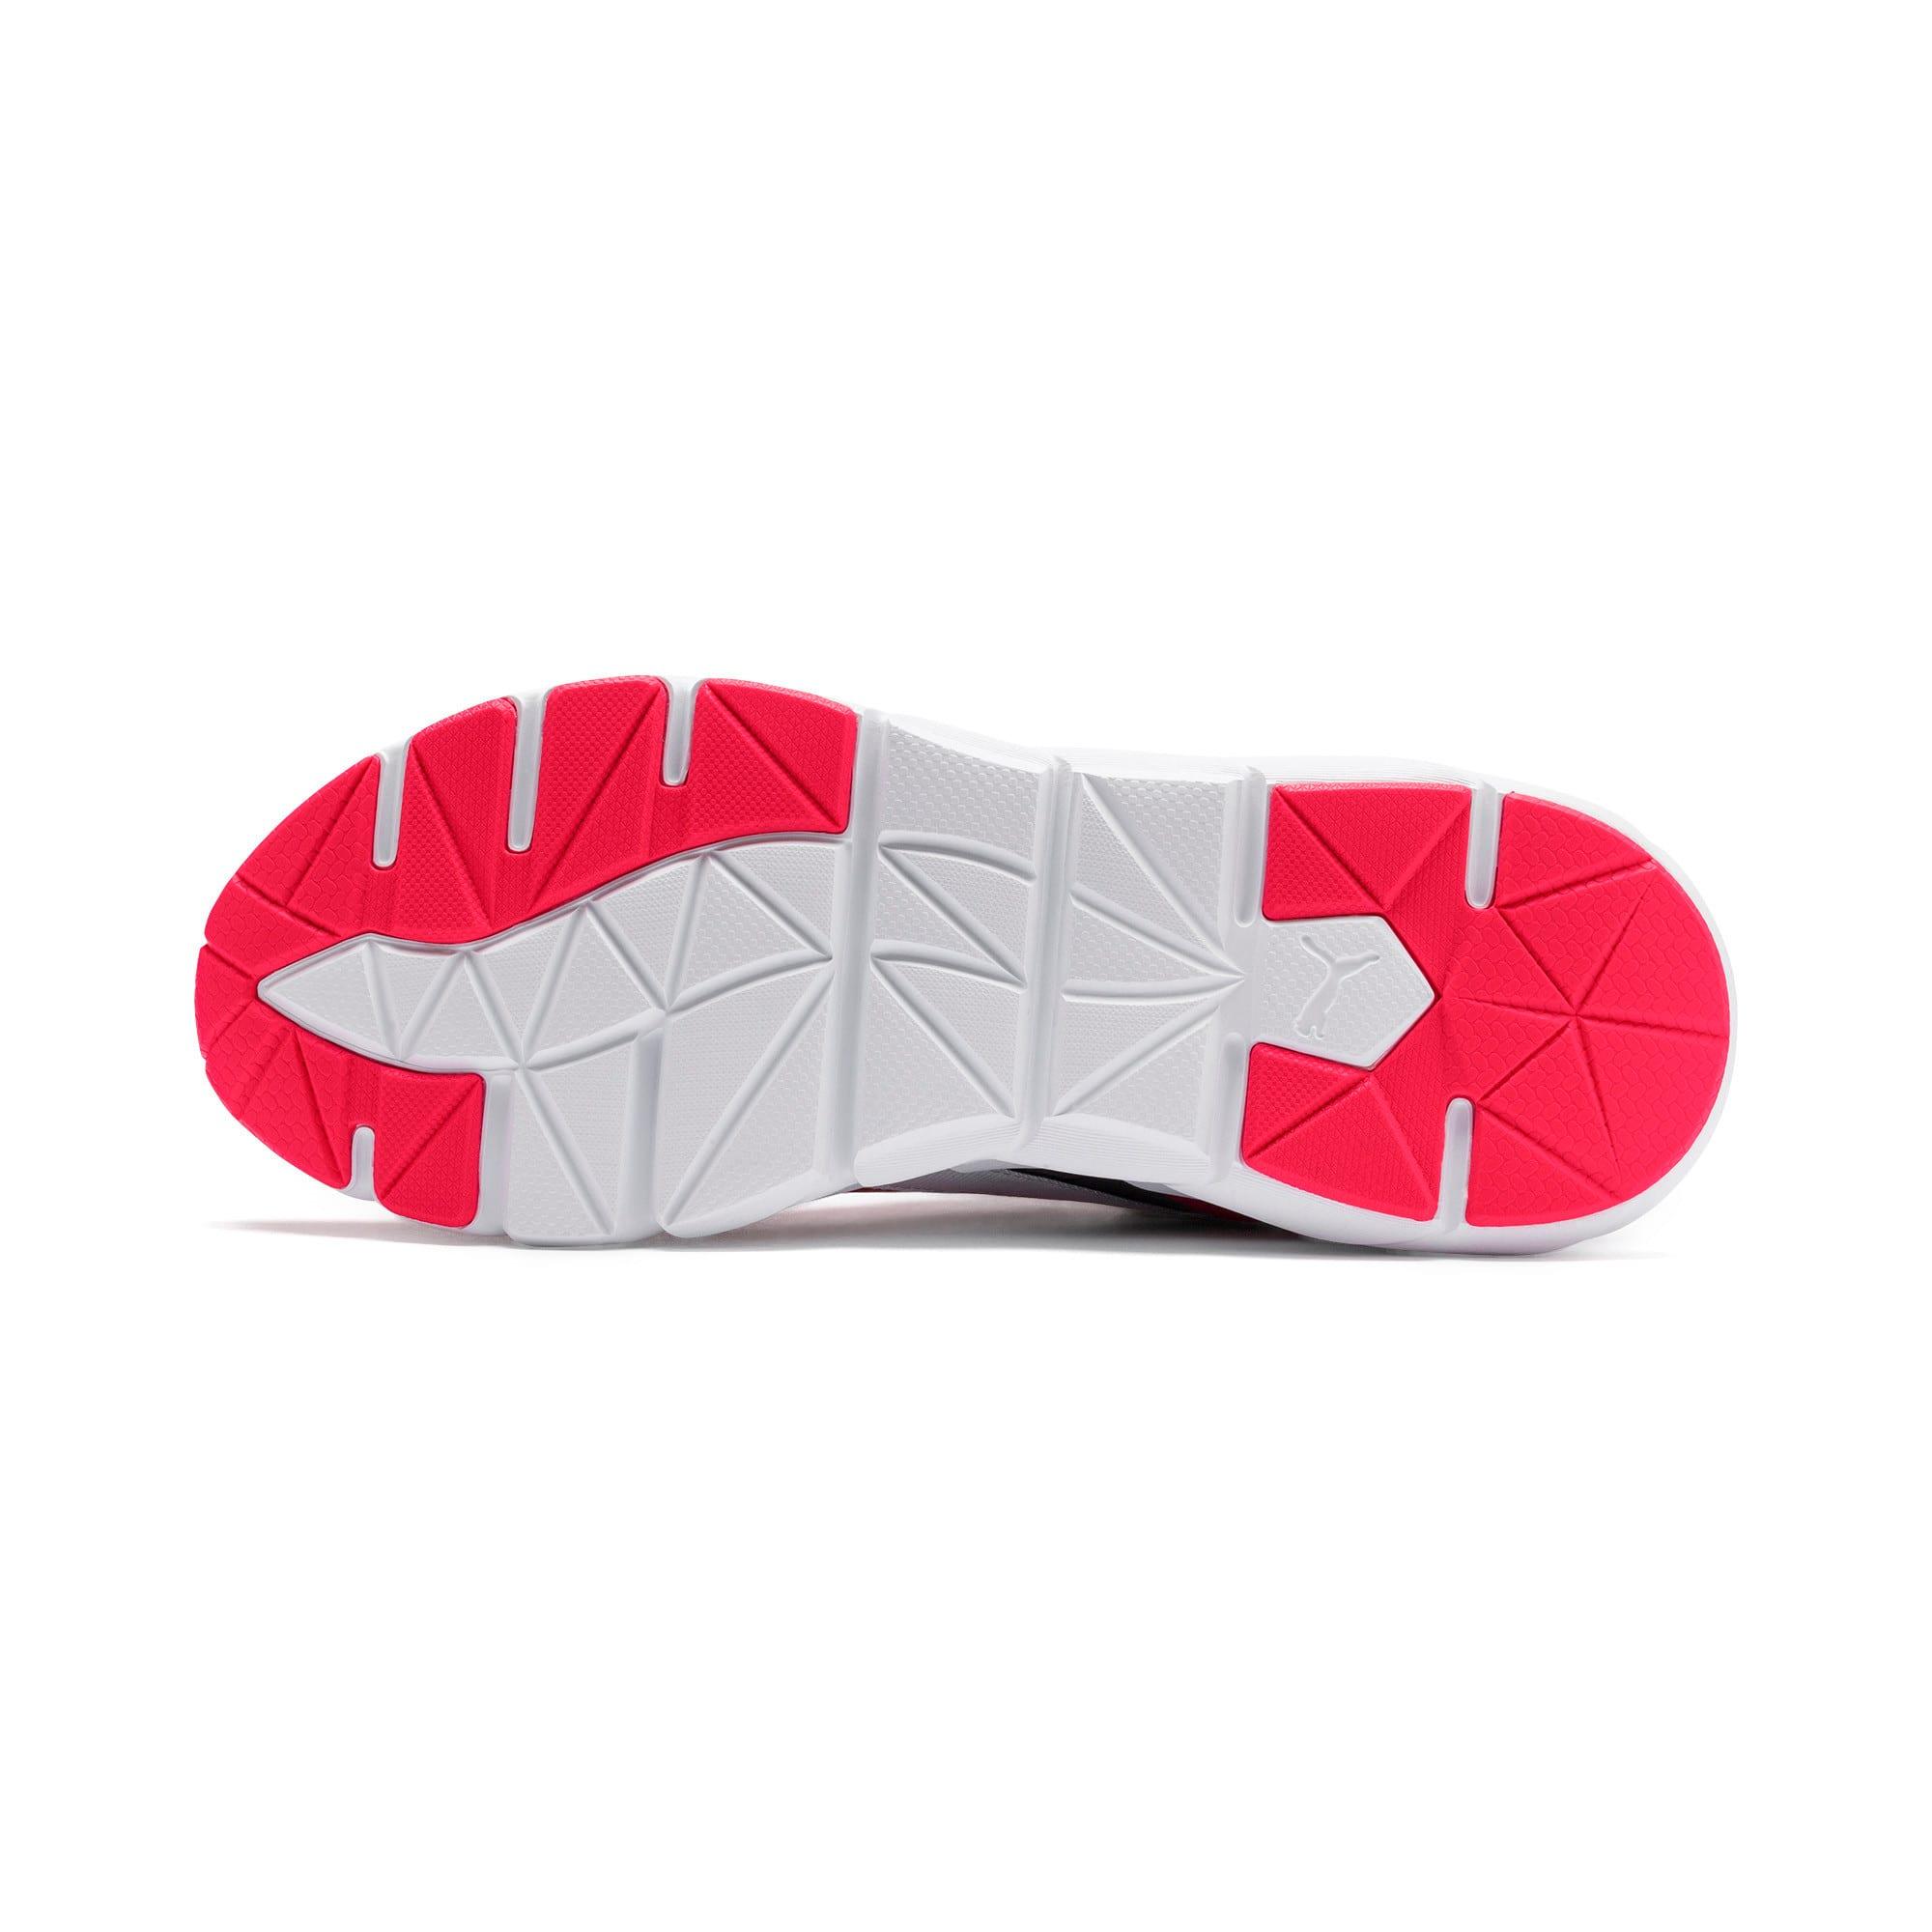 Thumbnail 5 of Weave XT Shift Women's Training Shoes, Nrgy Rose-Puma White, medium